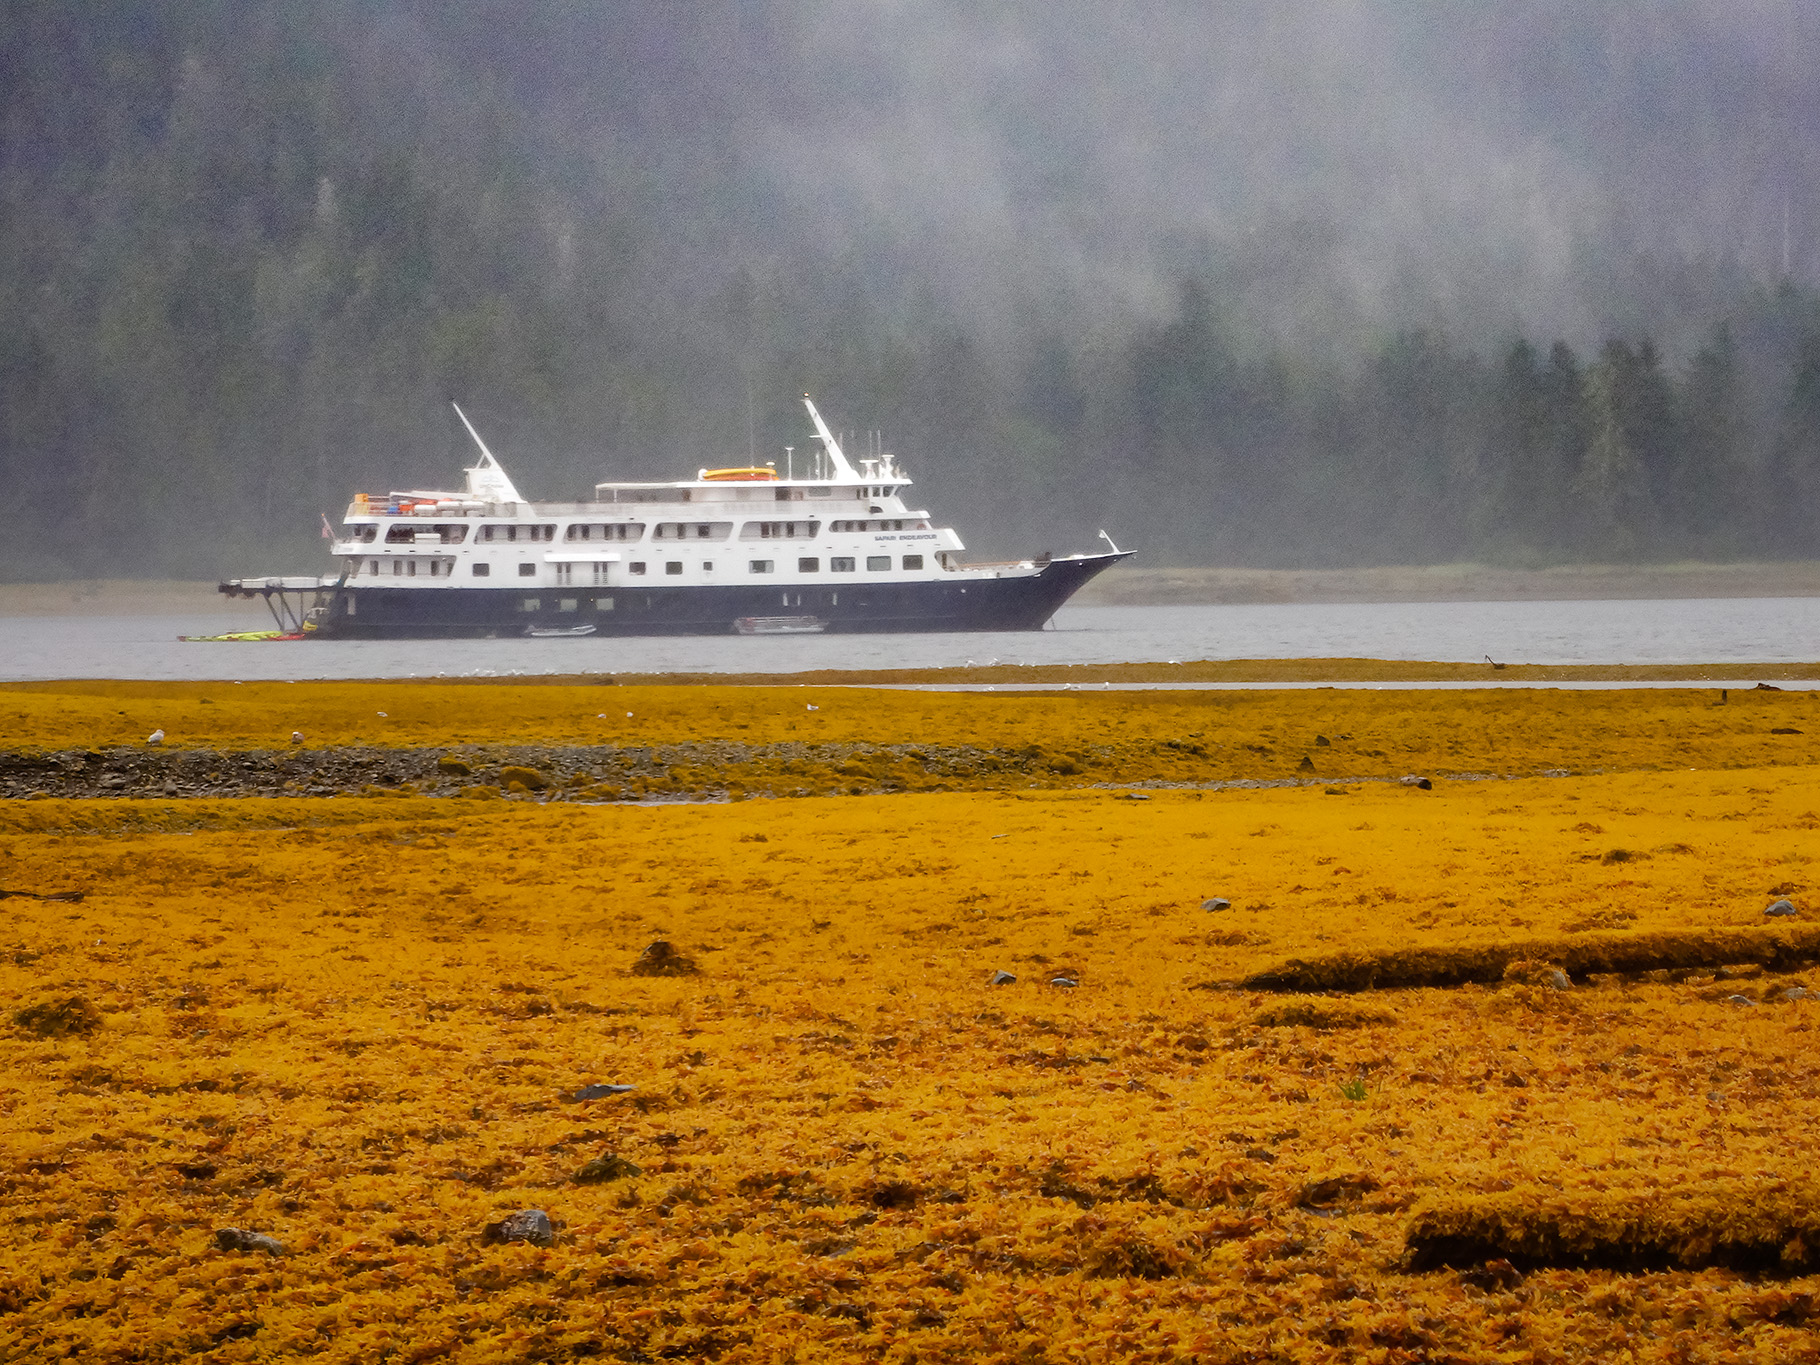 Safari Endeavor in the Sukoi Inlet